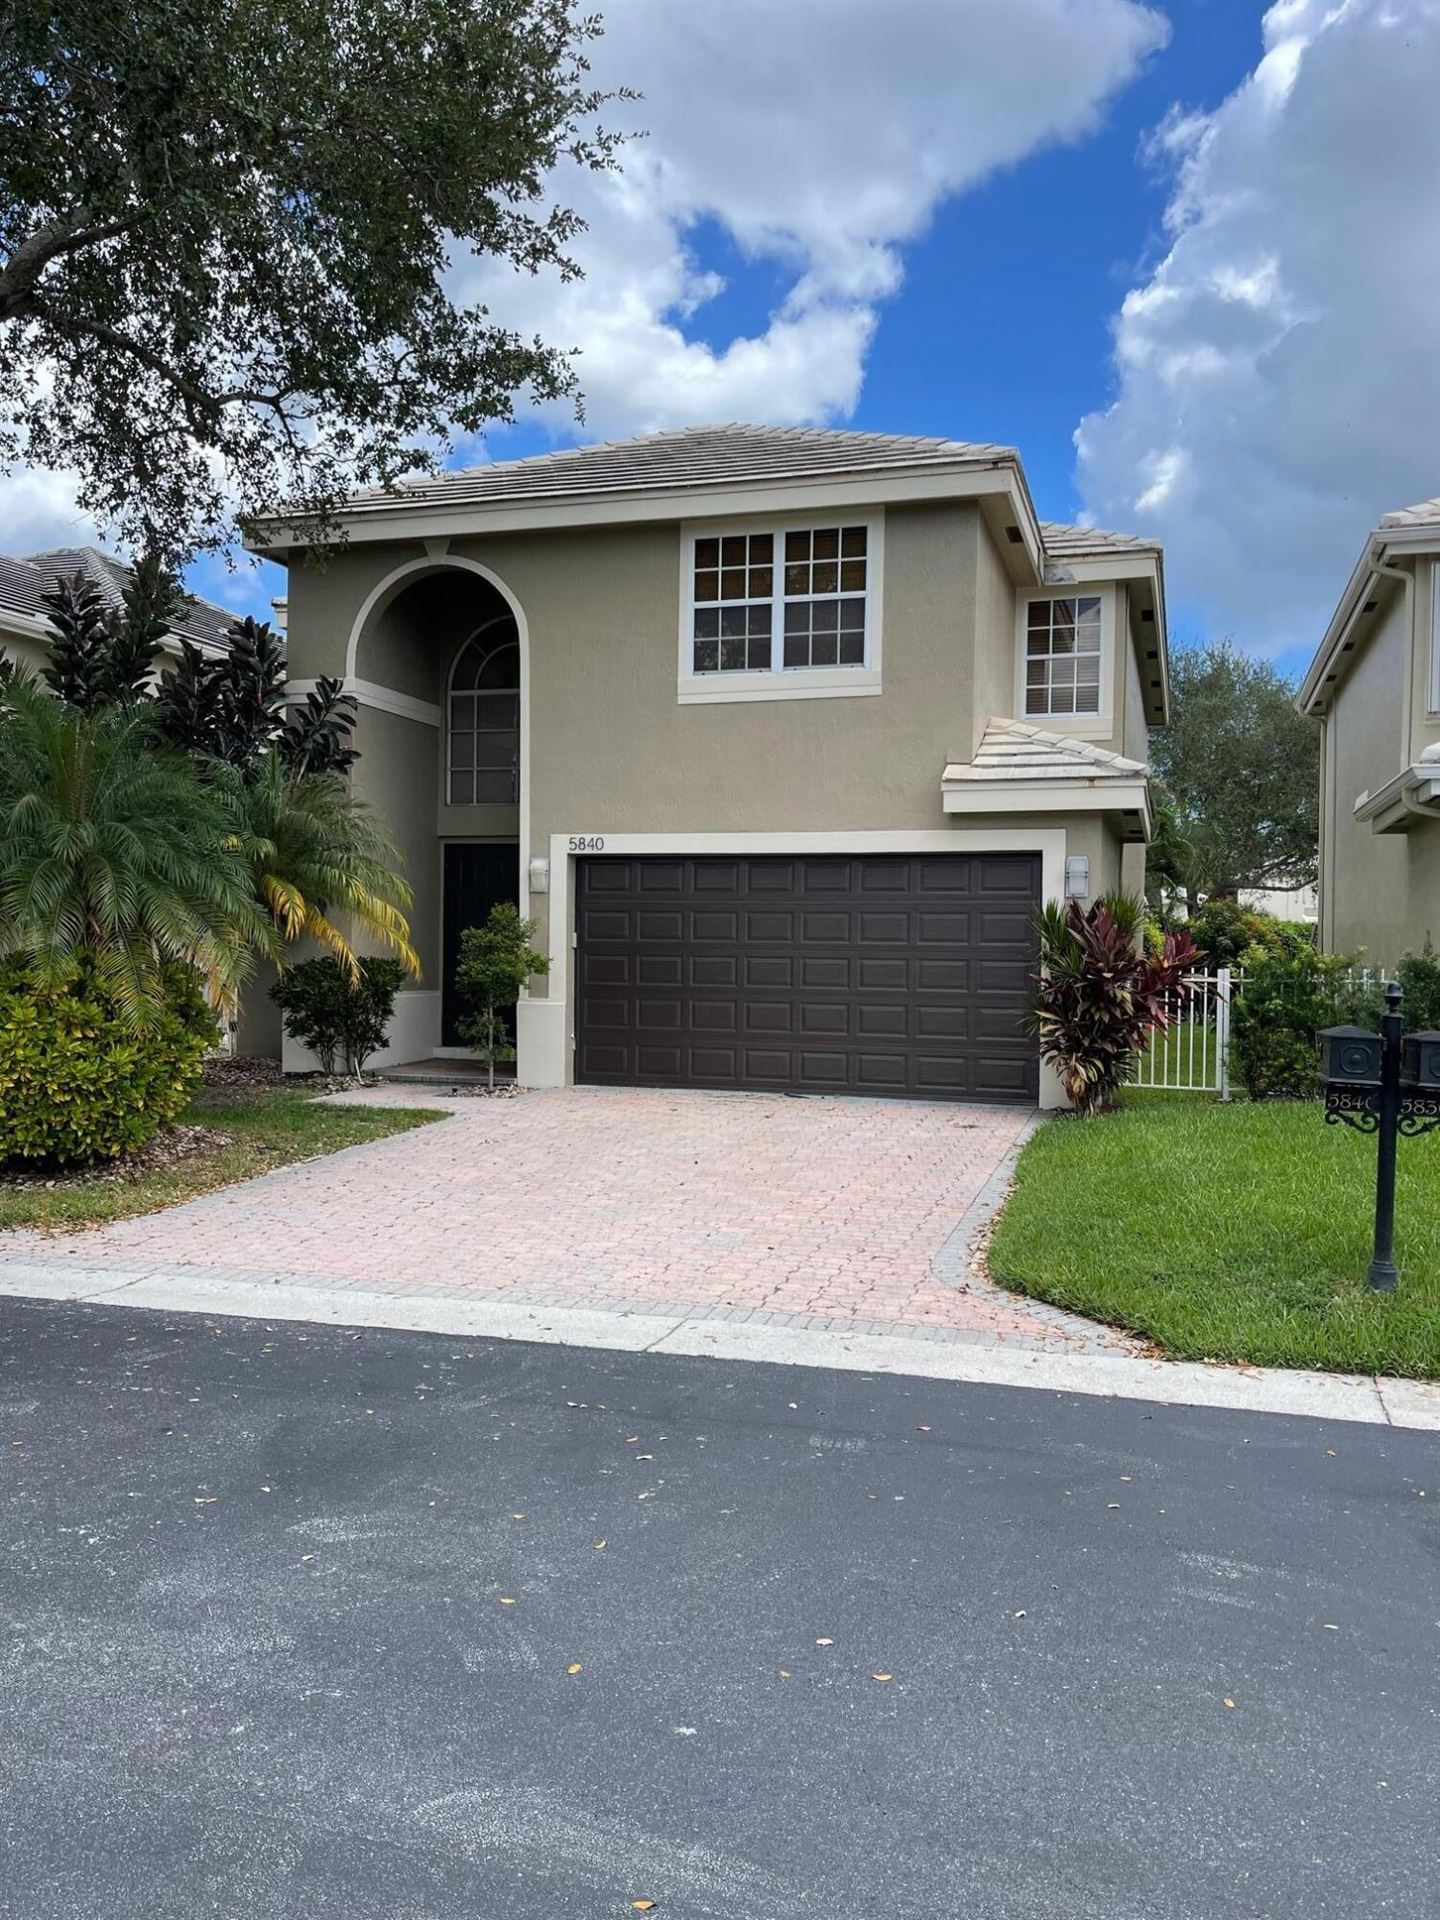 5840 NW 42nd Terrace, Boca Raton, FL 33496 - MLS#: RX-10742409